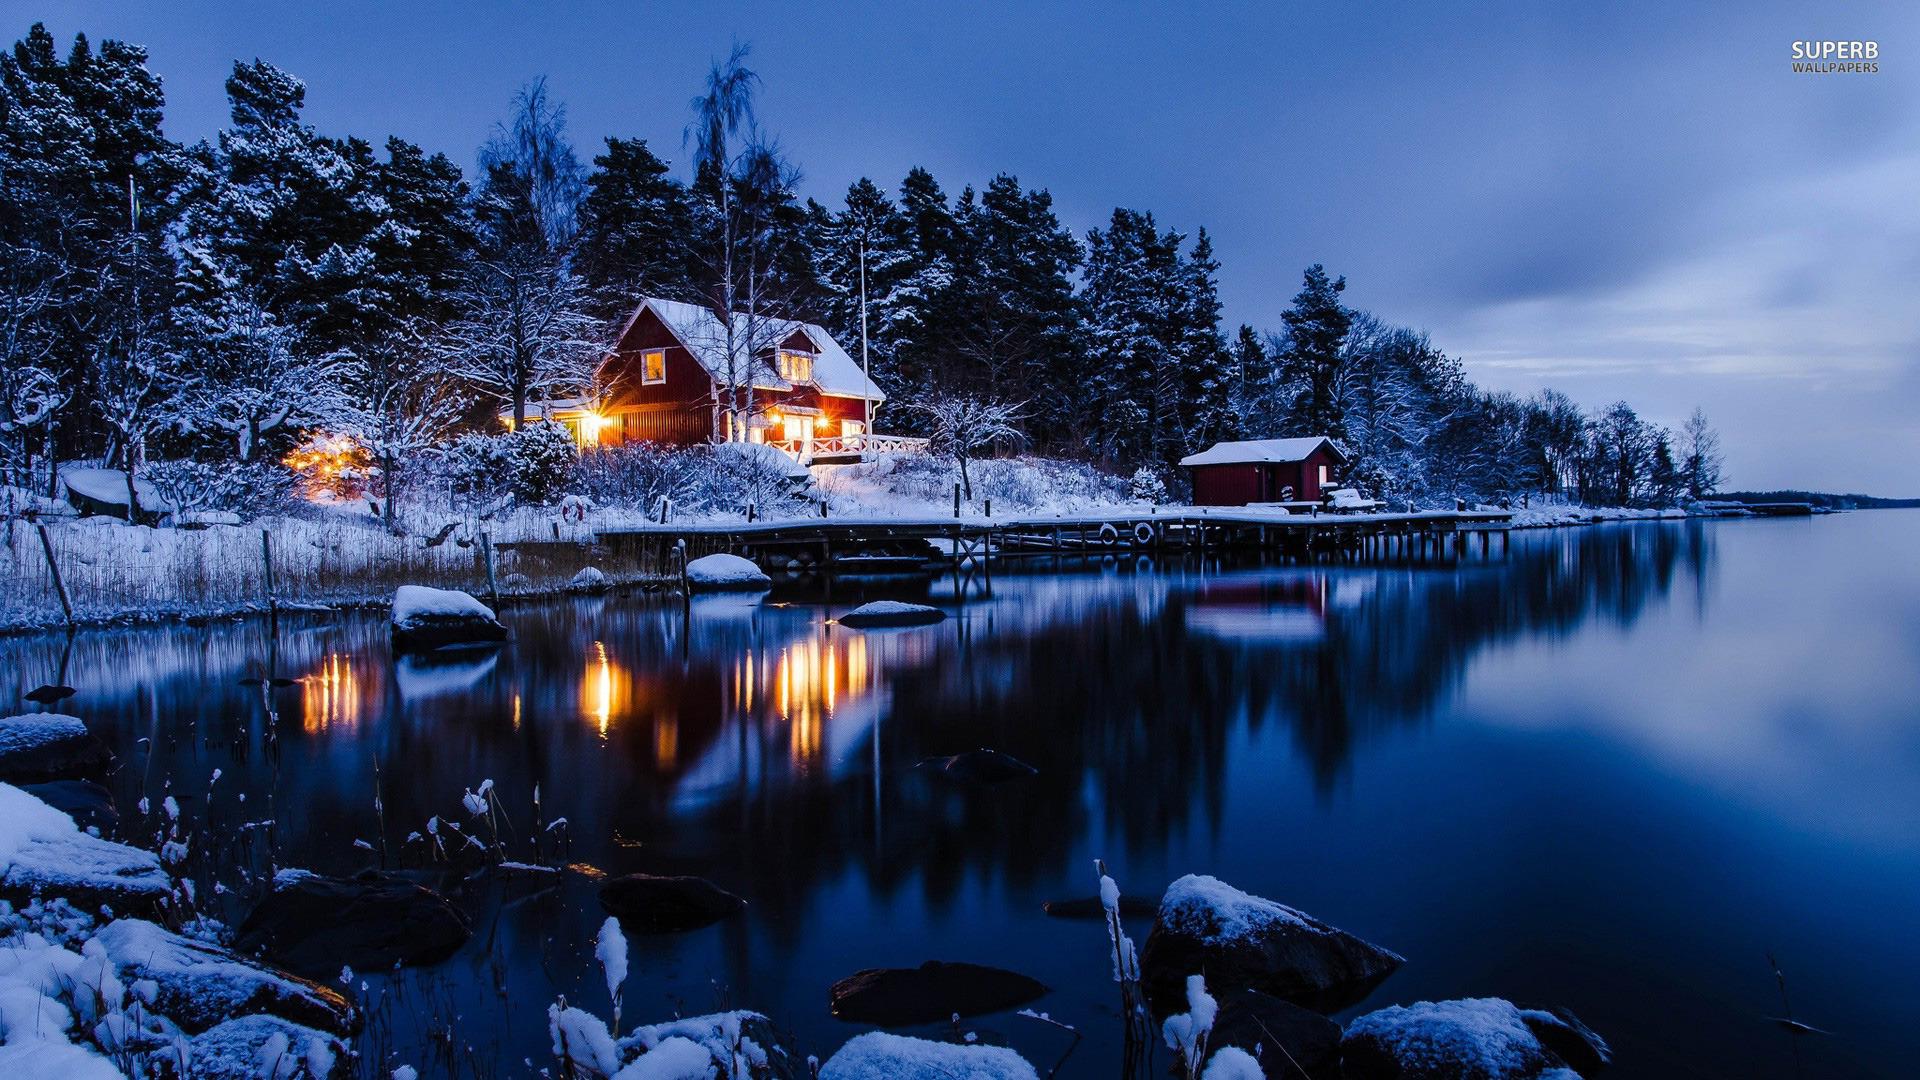 lakeside-winter-cabin-25436-1920x1080.jpg